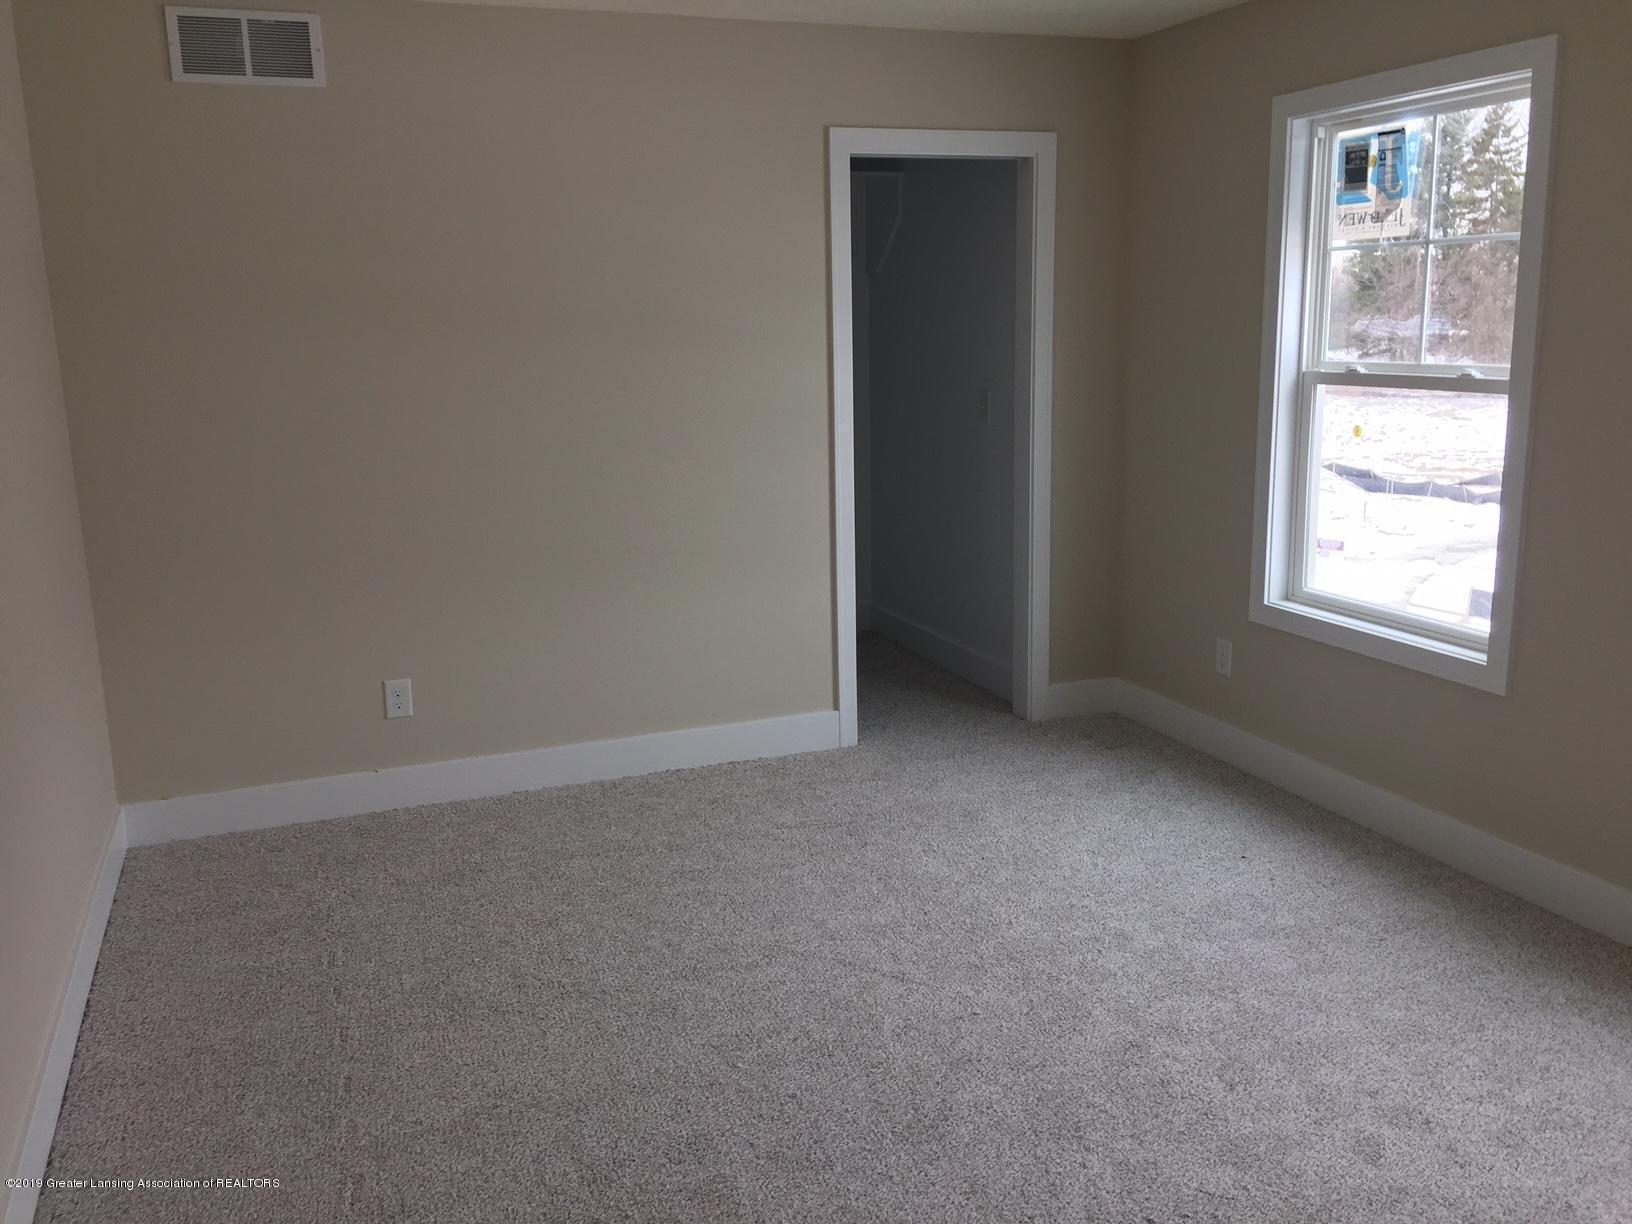 6014 Southridge Rd - 14 - 14